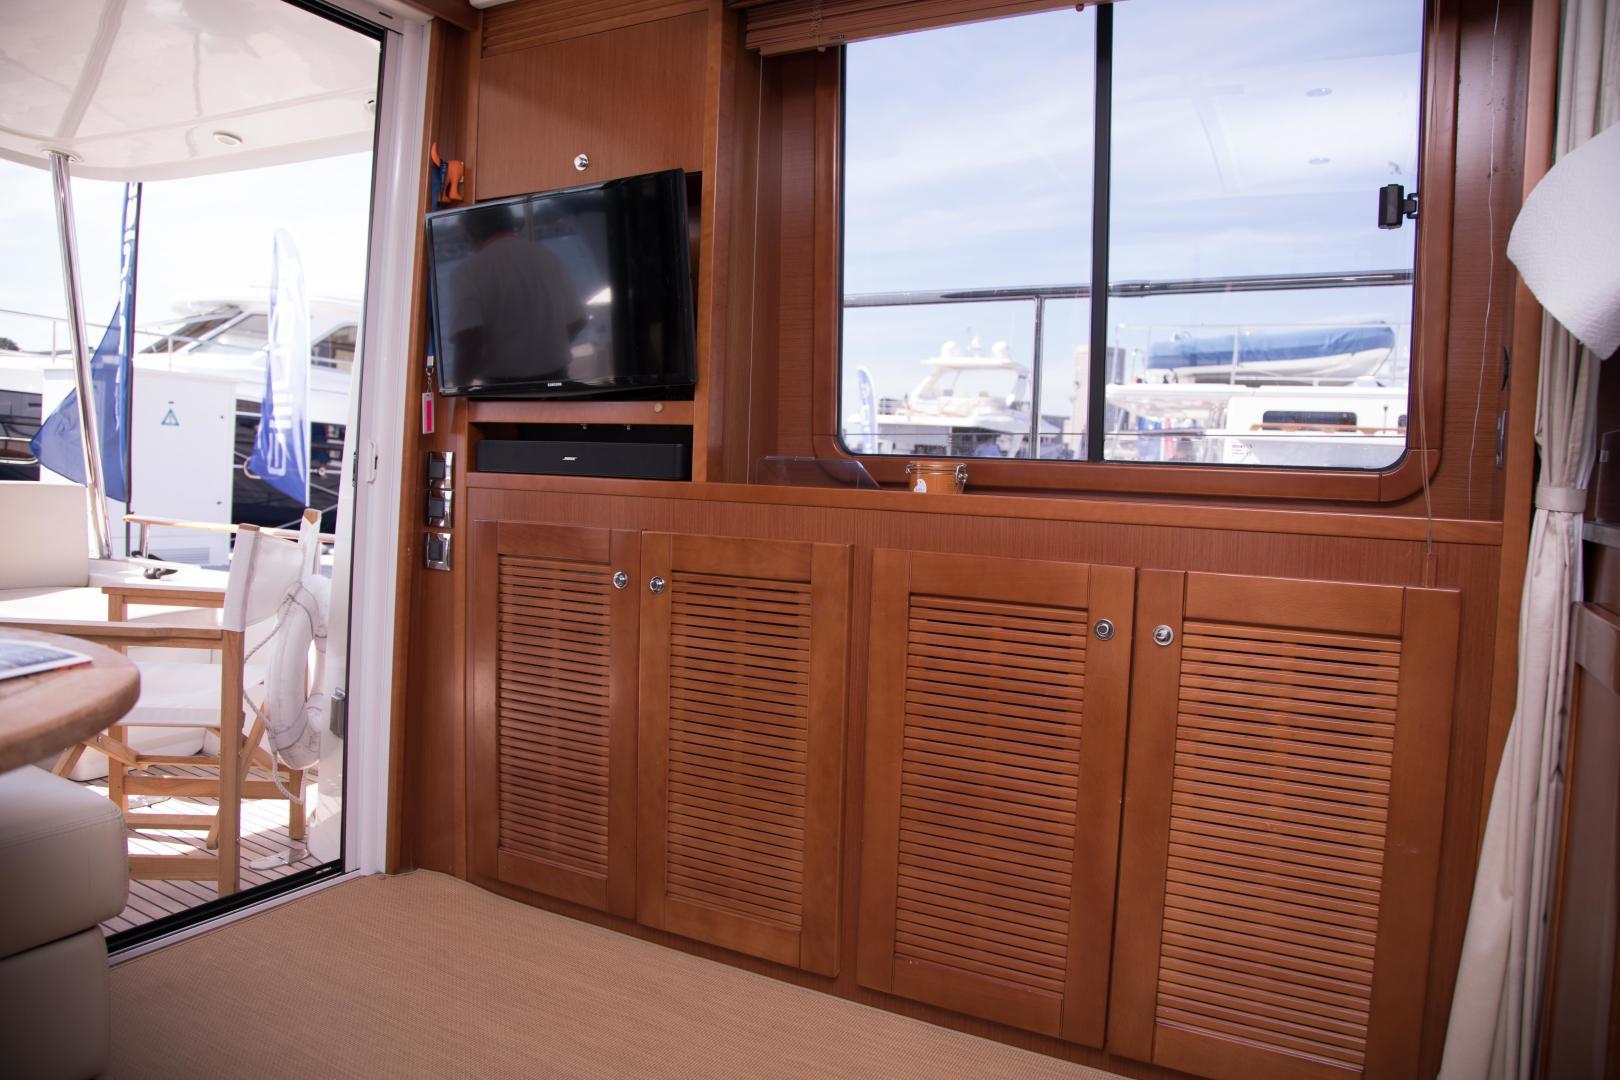 Beneteau-Swift Trawler 2012-MLC IV Baltimore-Maryland-United States-1355973 | Thumbnail